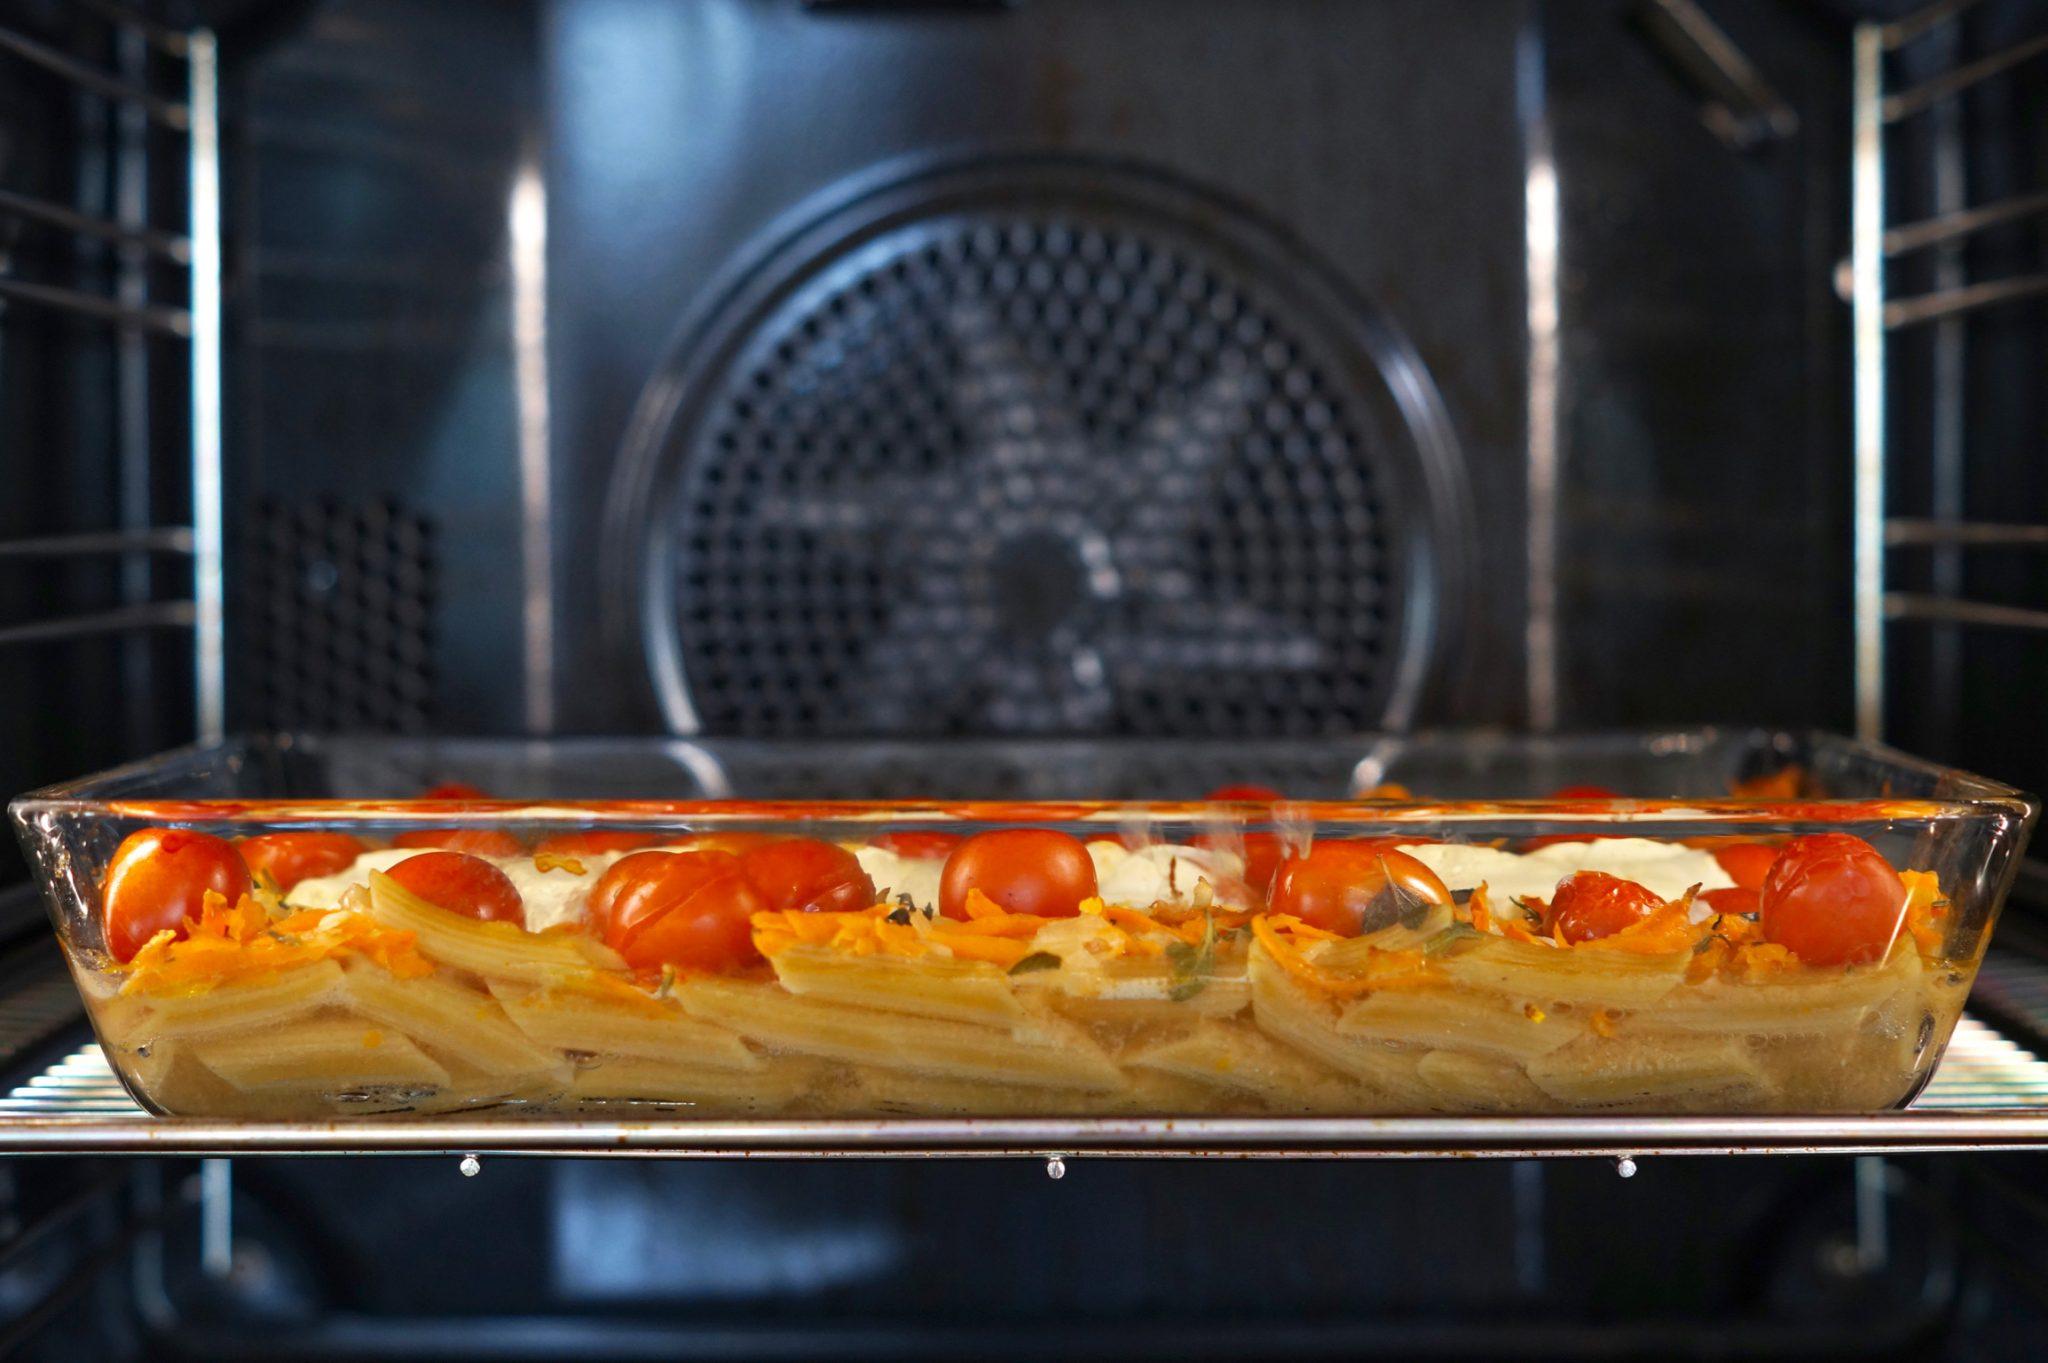 Baked-Feta im Ofen